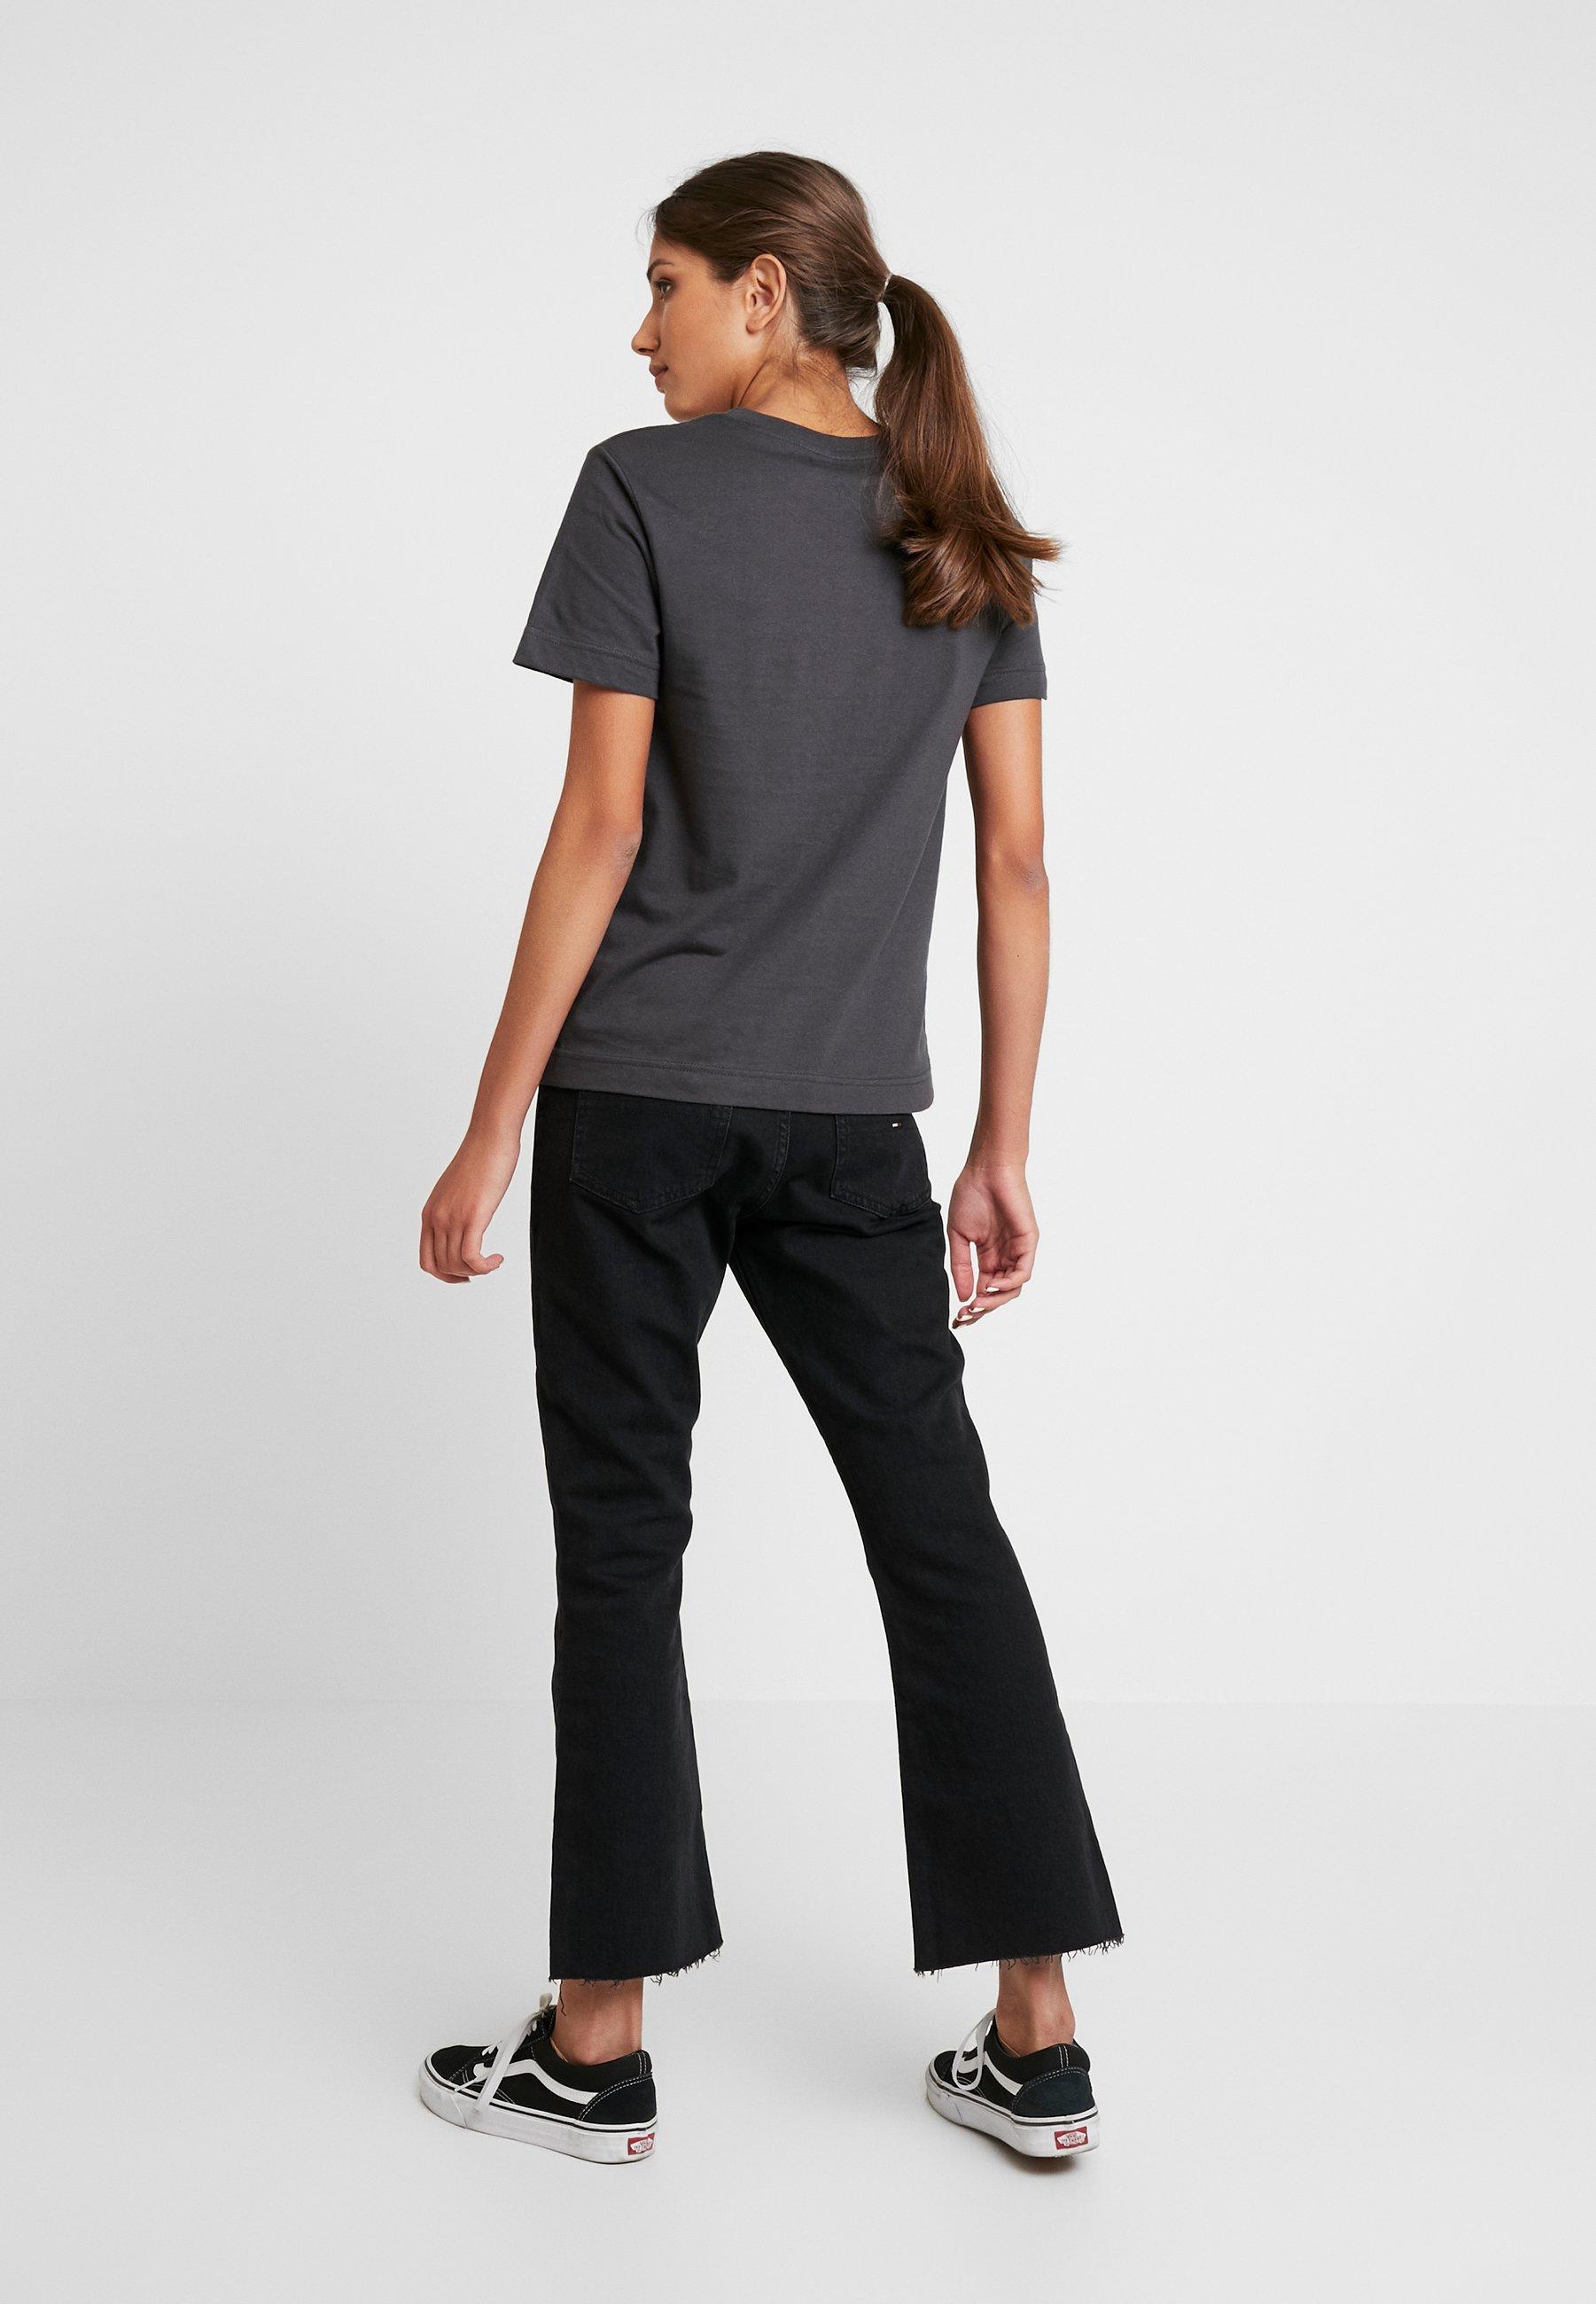 Respect Mysen shirt Imprimé Dedicated LifeT Charcoal ALRj54q3